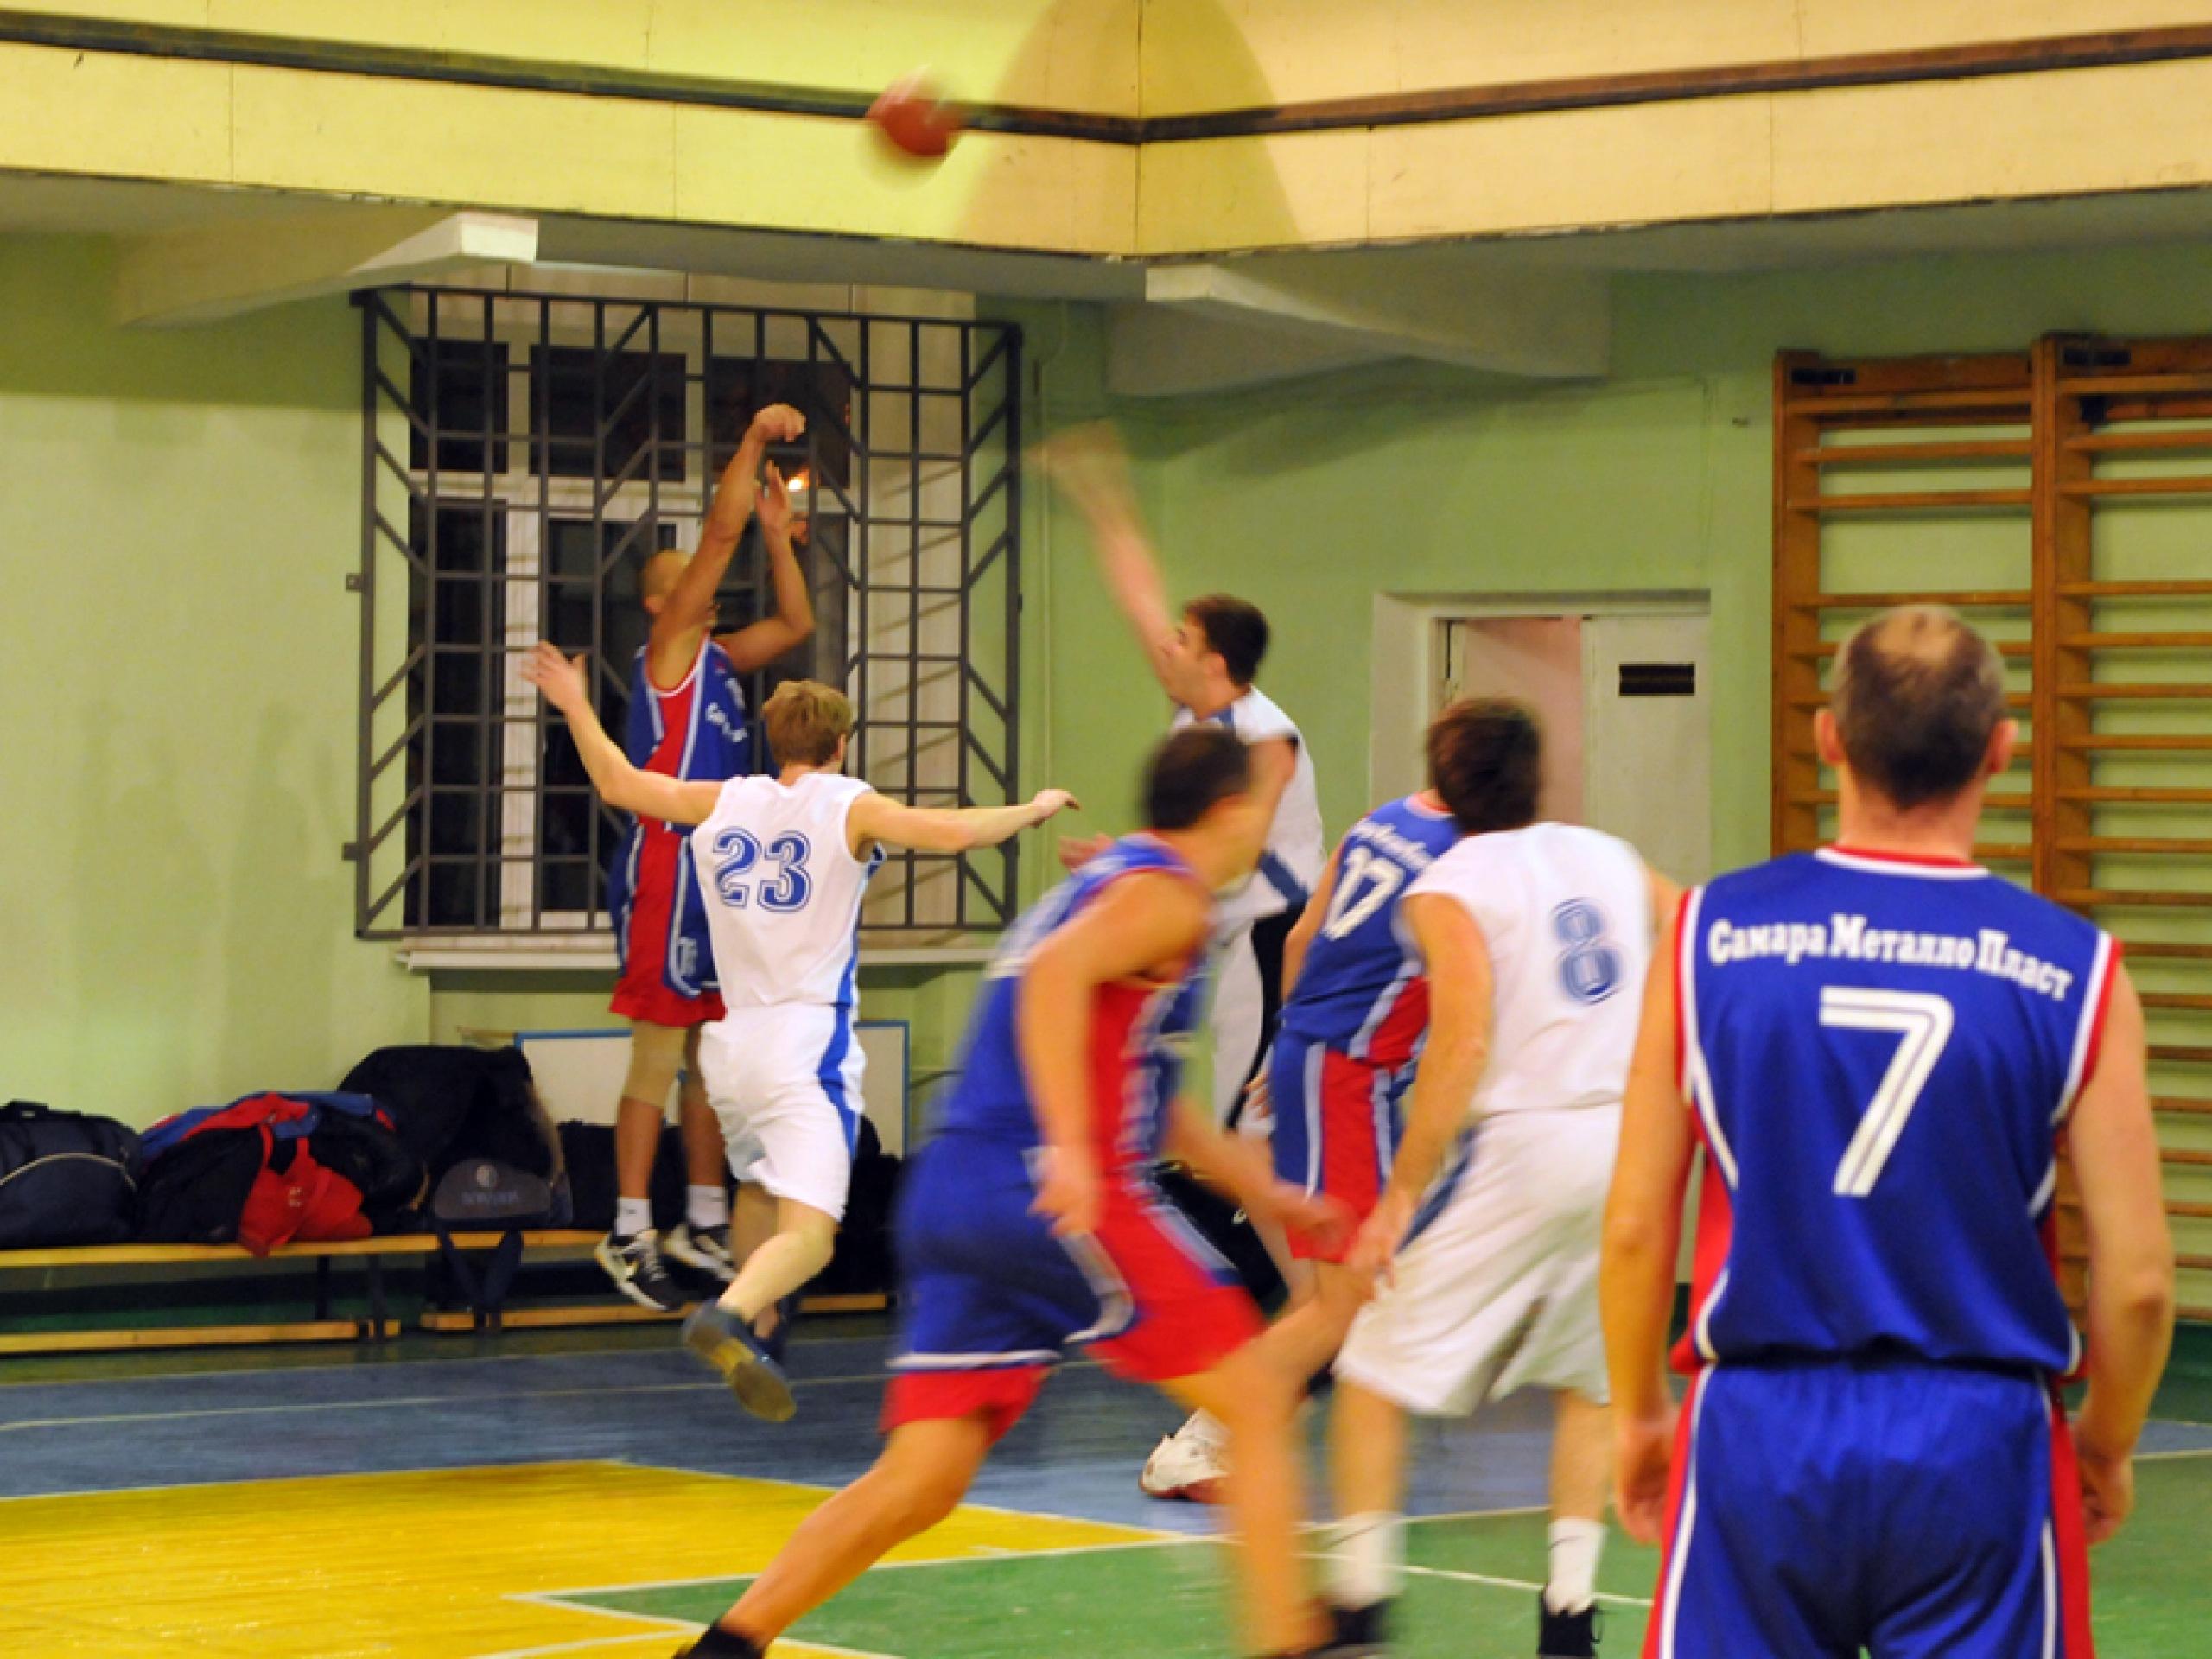 Чемпионат г. Самара 2010-2011 гг.